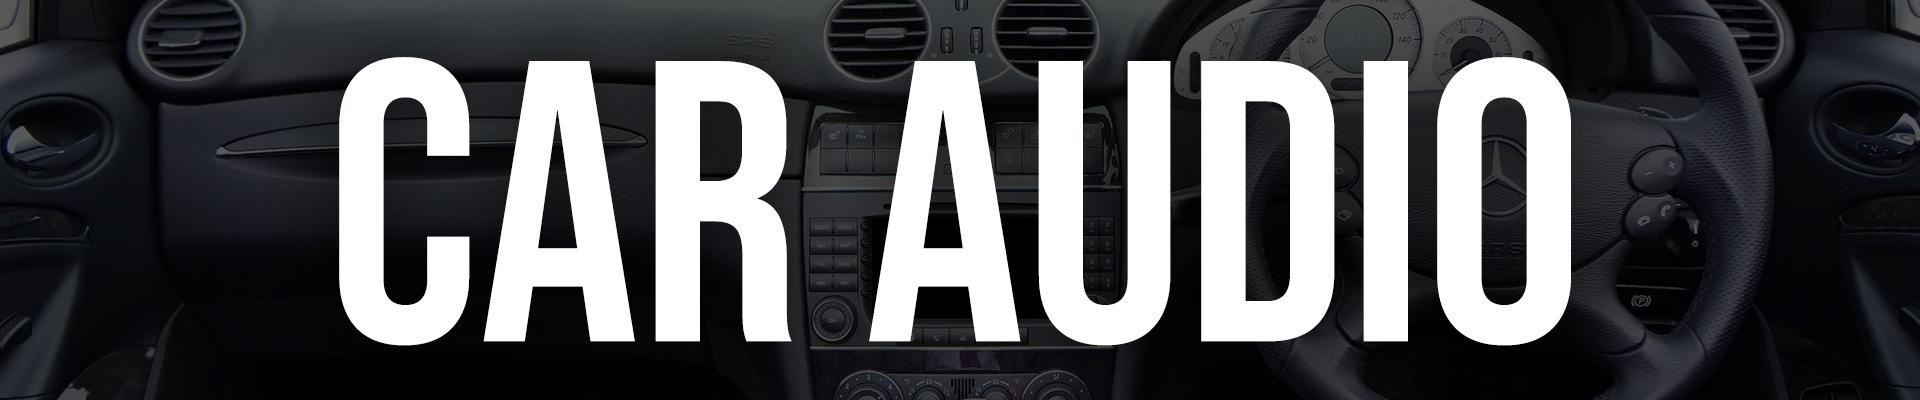 Car Audio Banner